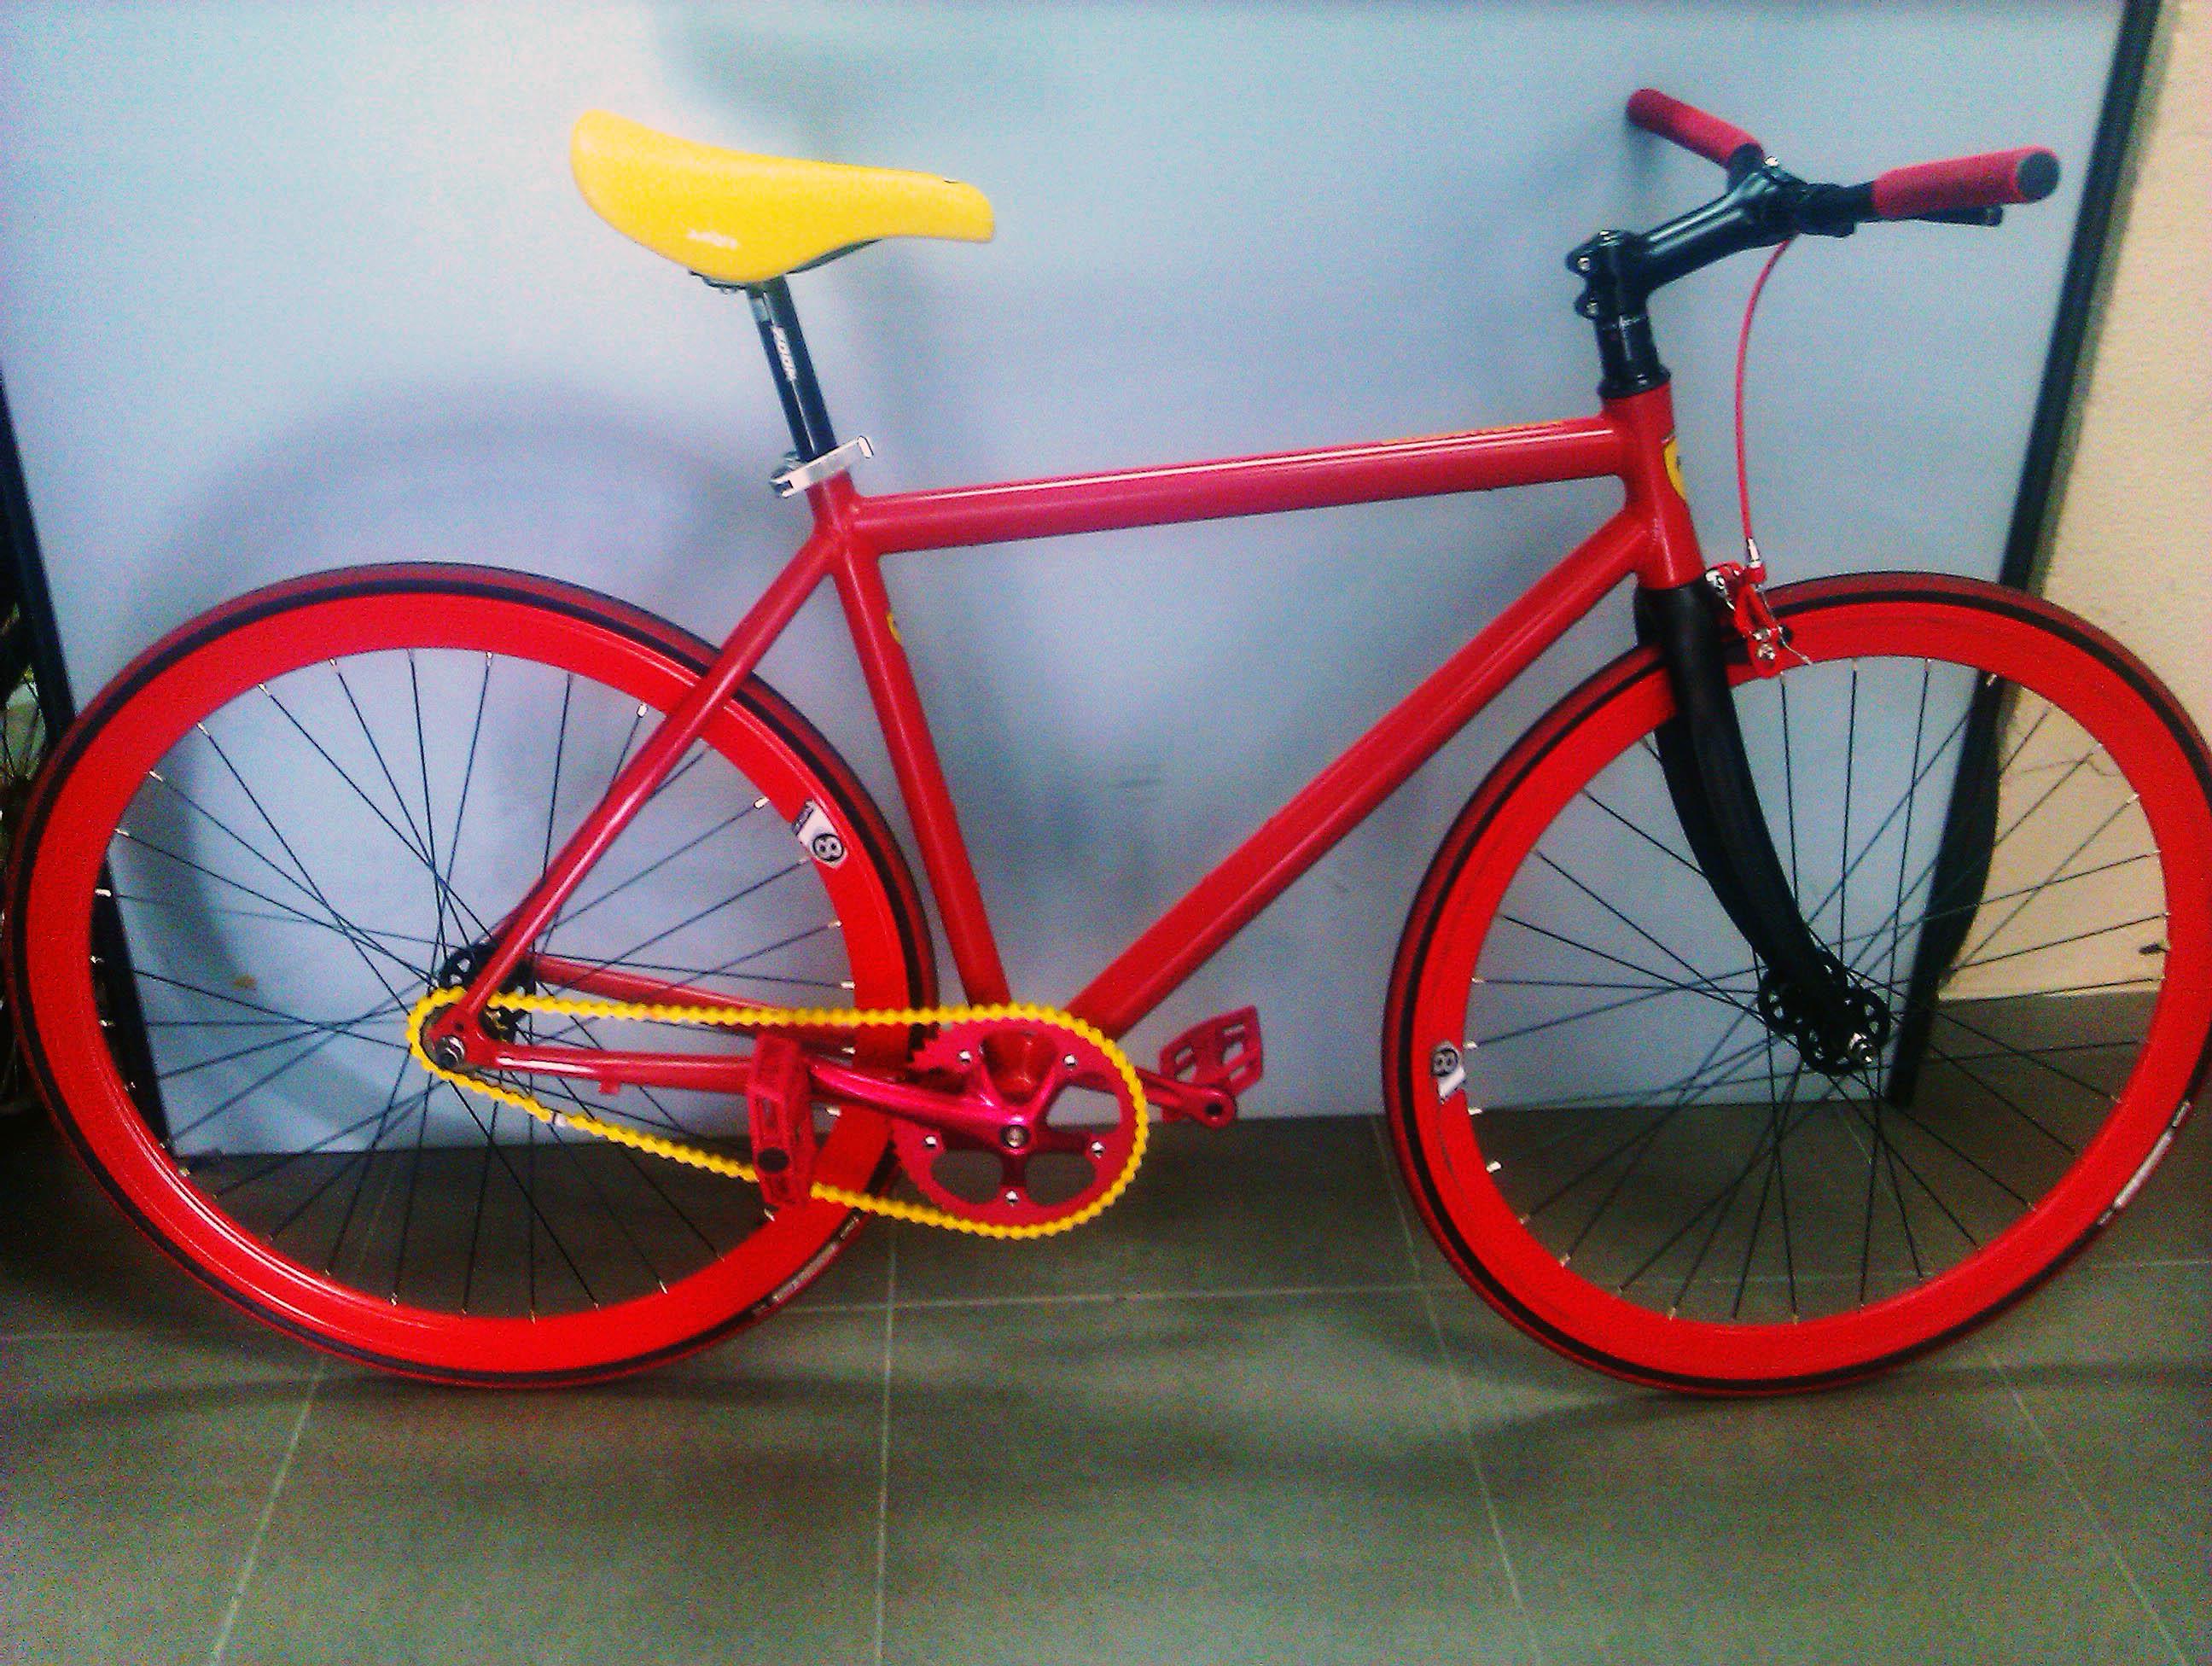 Fixie: Sin frenos, sin marchas, solo tus piernas y tu bicicleta ...